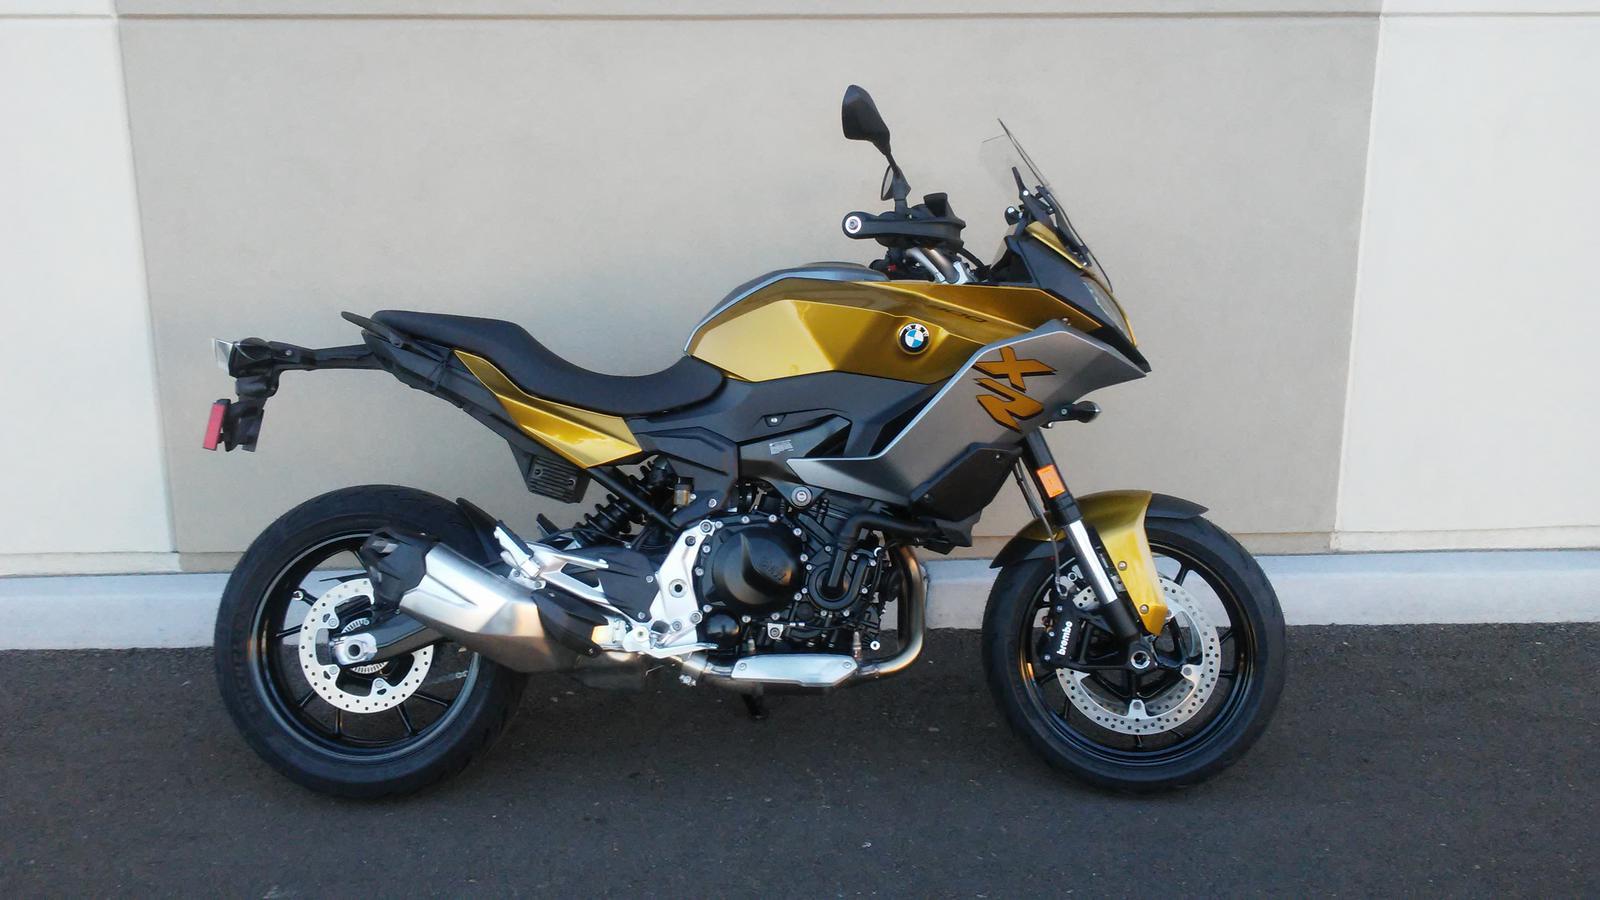 2020 Bmw F900xr For Sale In Peoria Az Go Az Motorcycles In